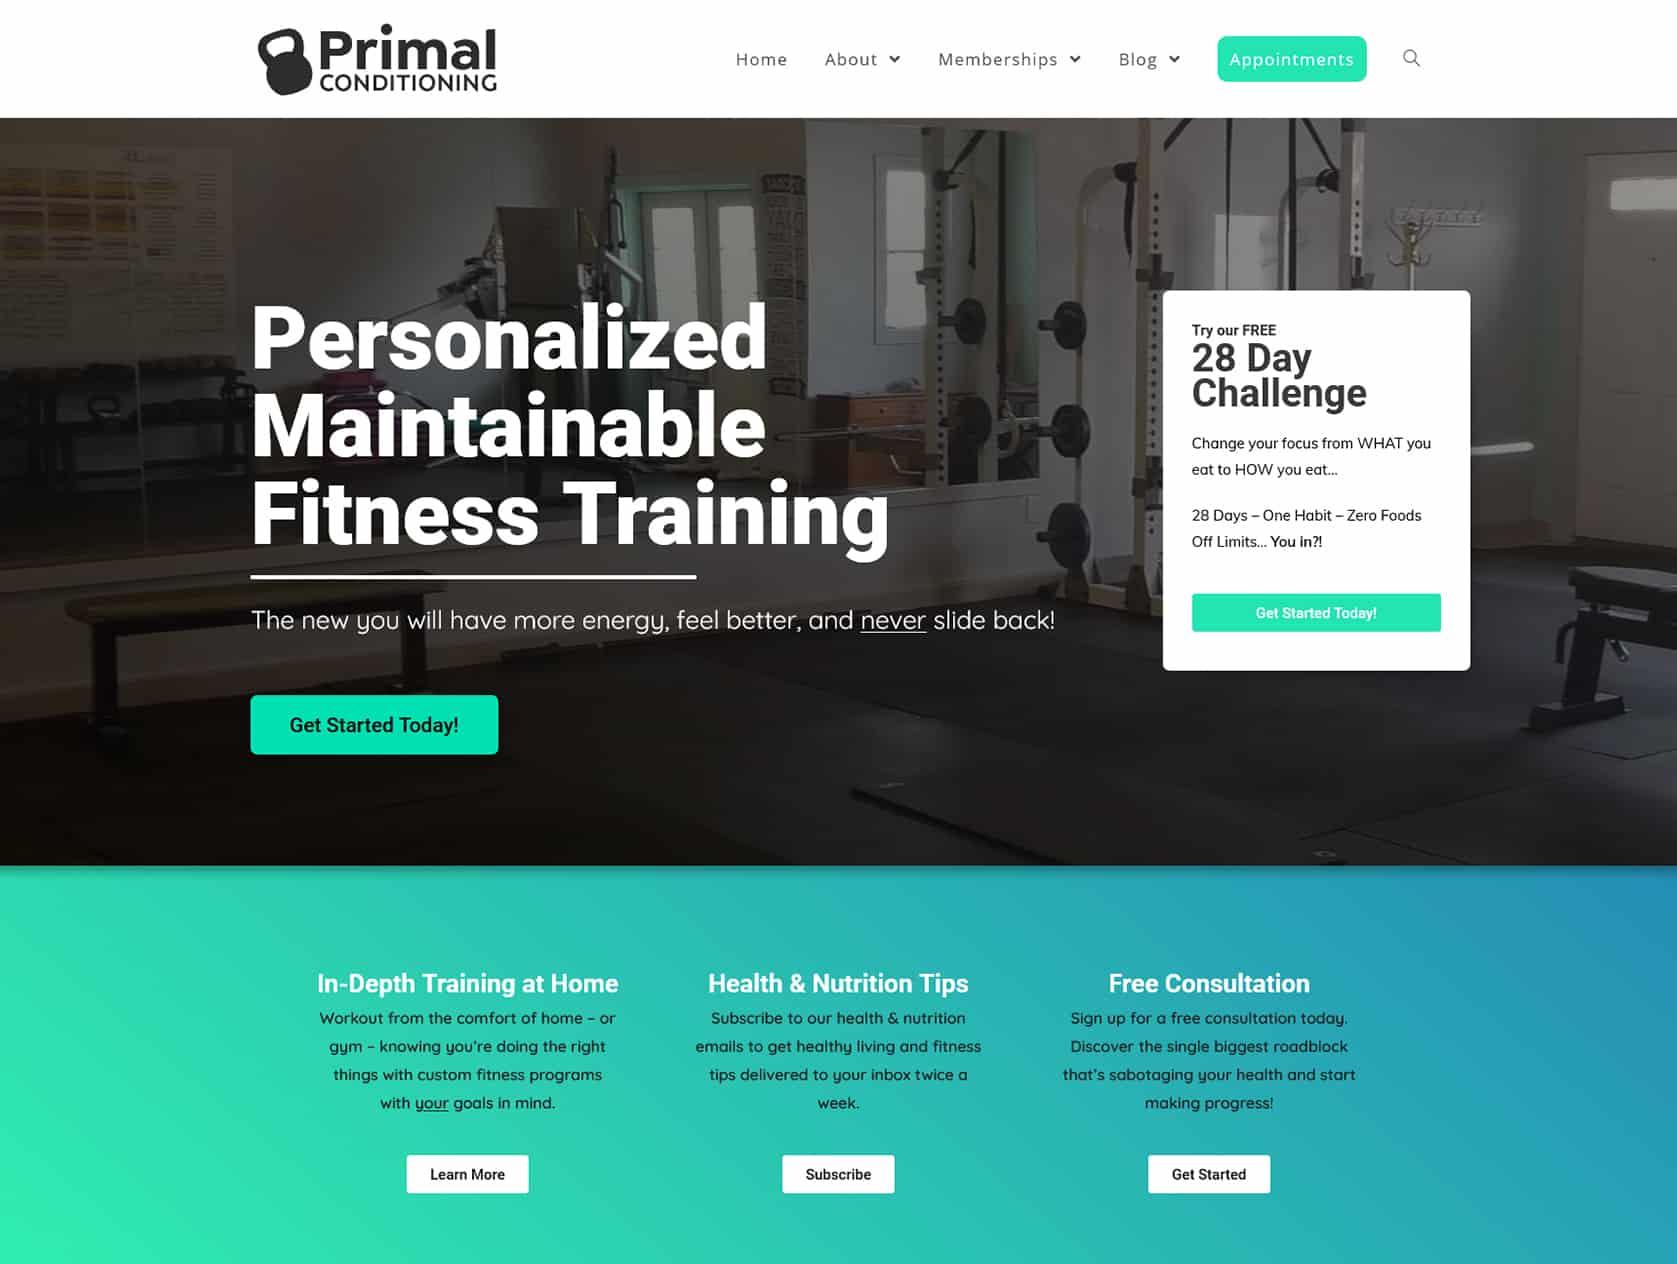 Primal after website redevelopment